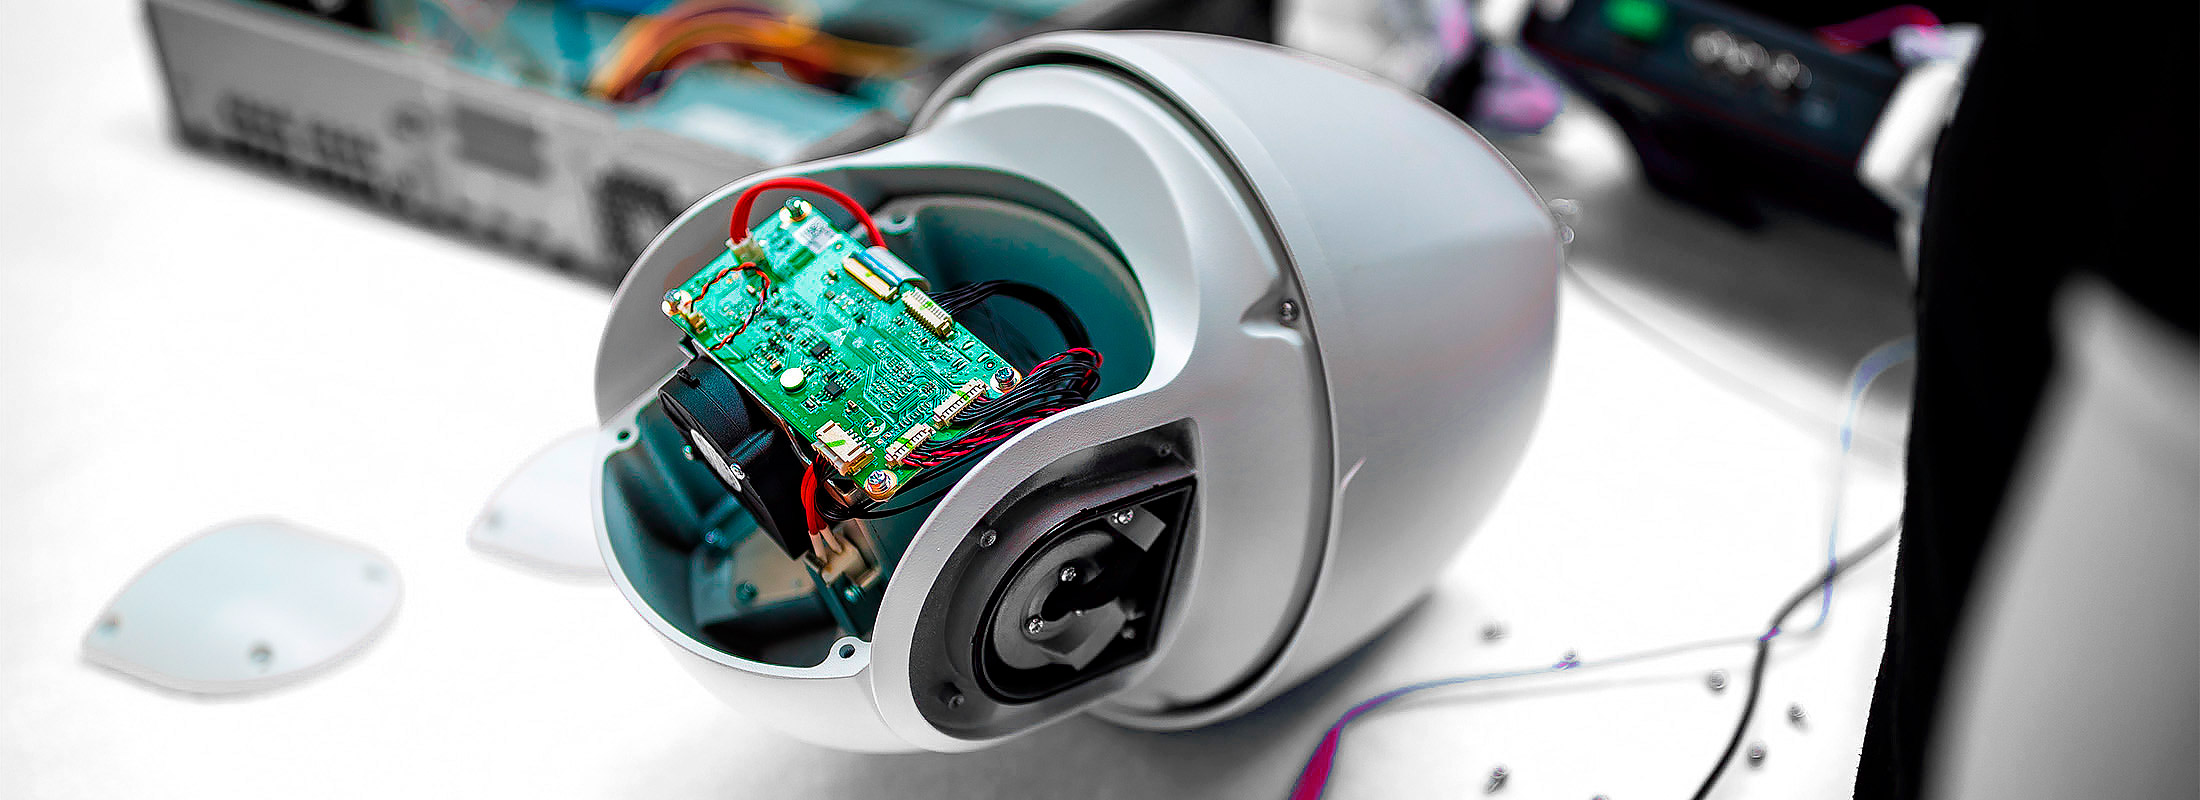 Speed Dome IP камеры для видеонаблюдения без корпуса